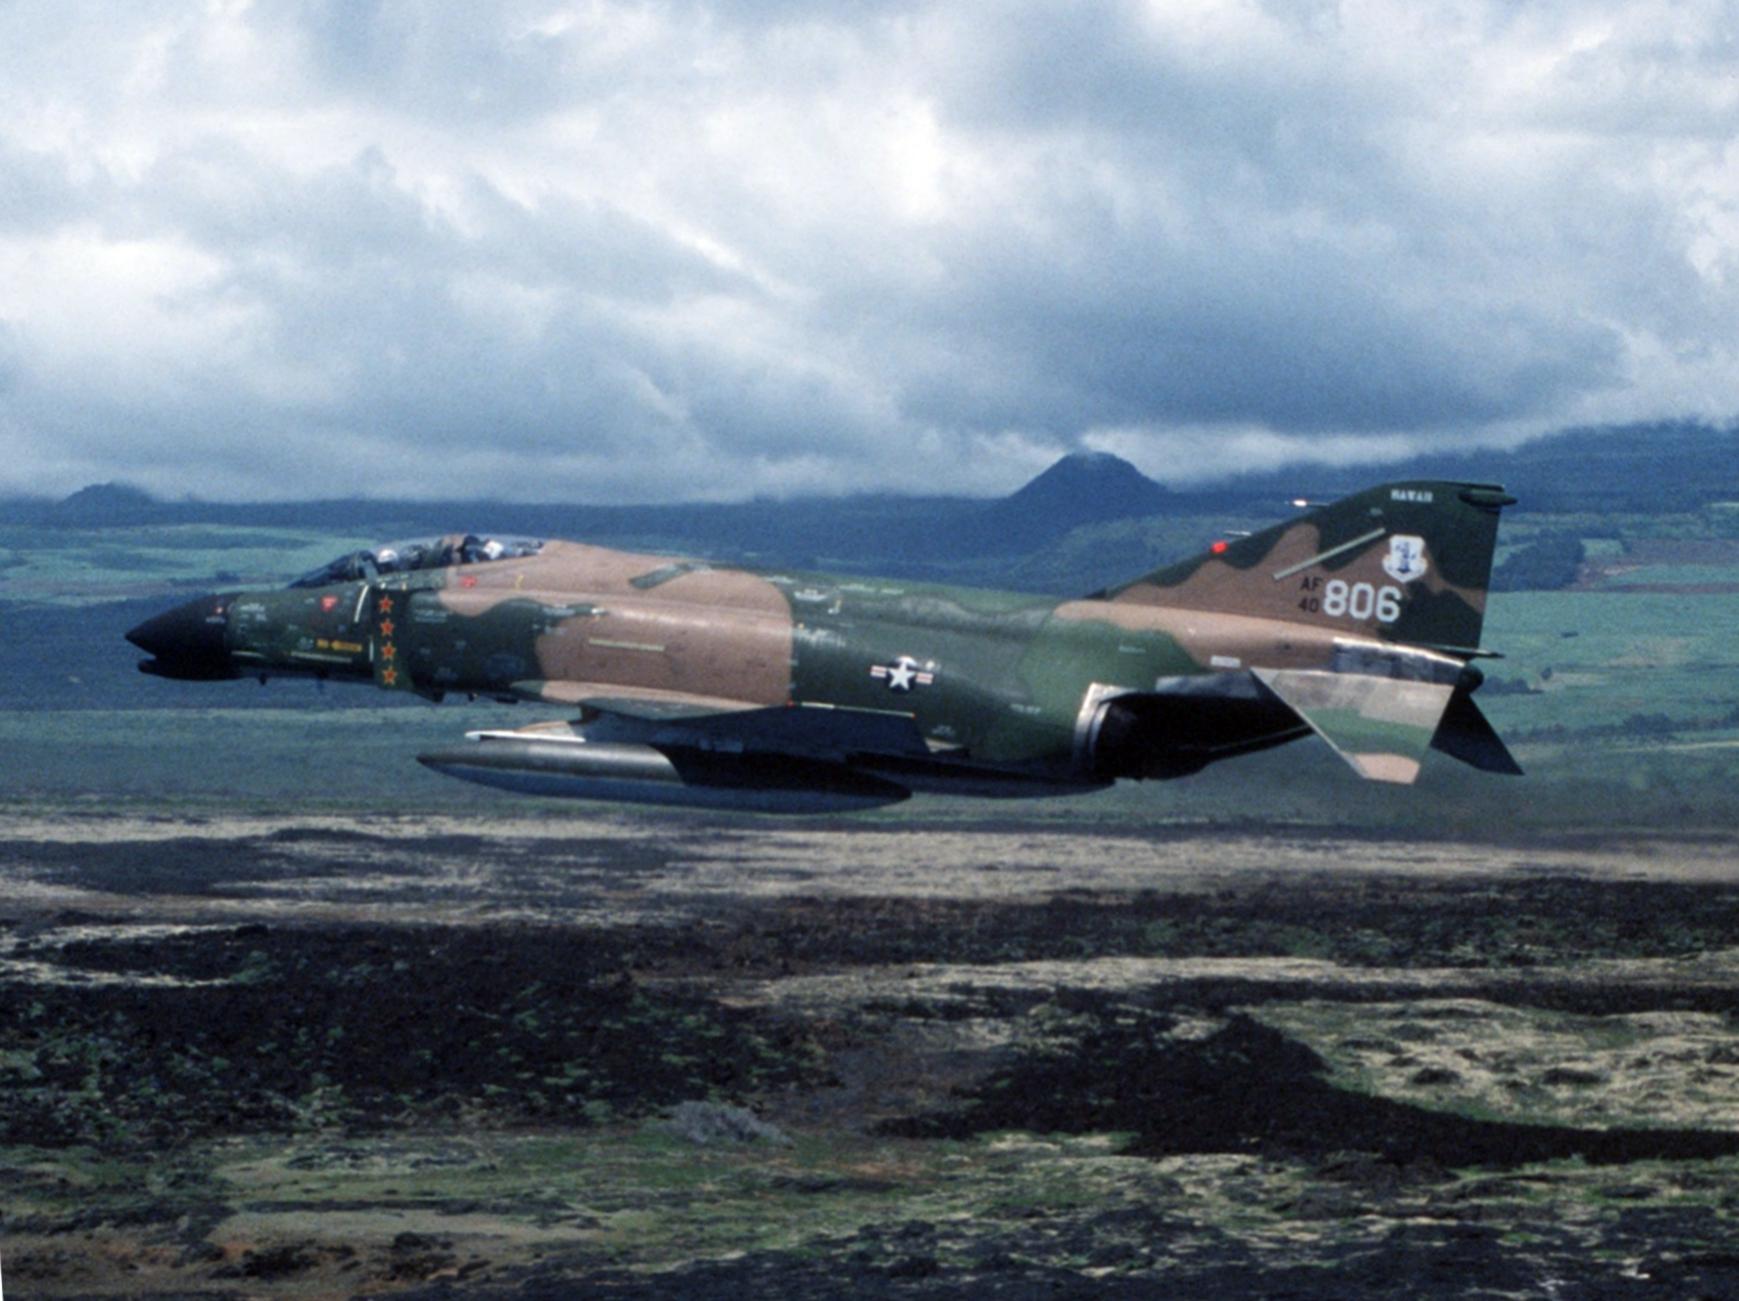 Hawaii Flight And Hotel Deals